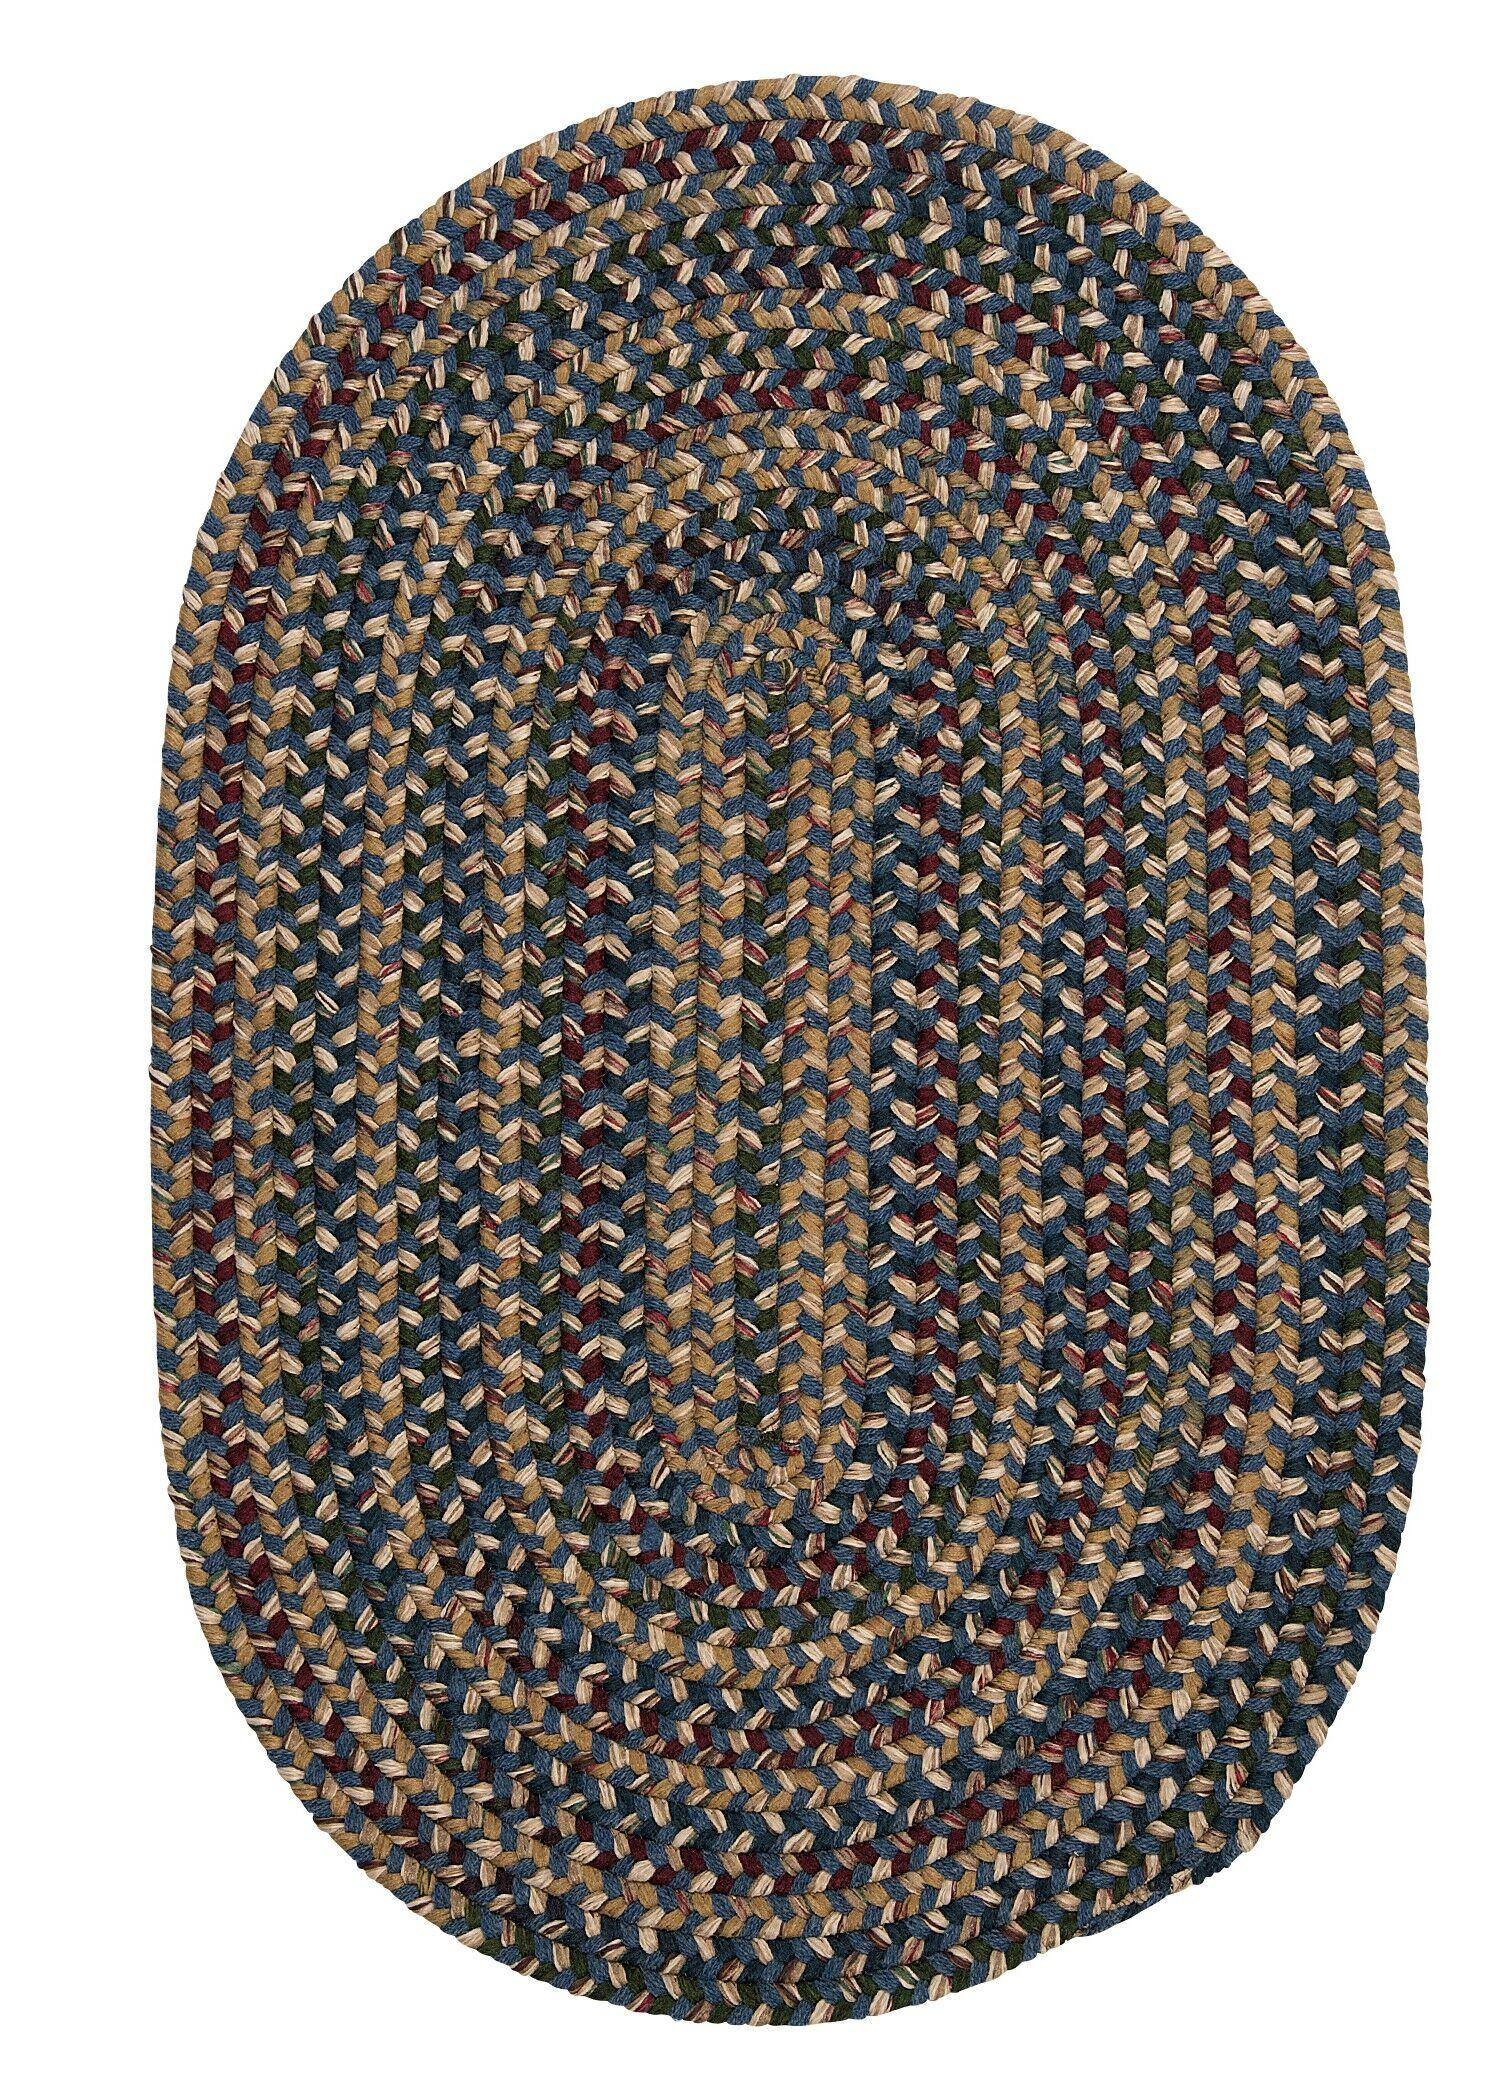 Greenlaw Blue Area Rug Rug Size: Oval 12' x 15'